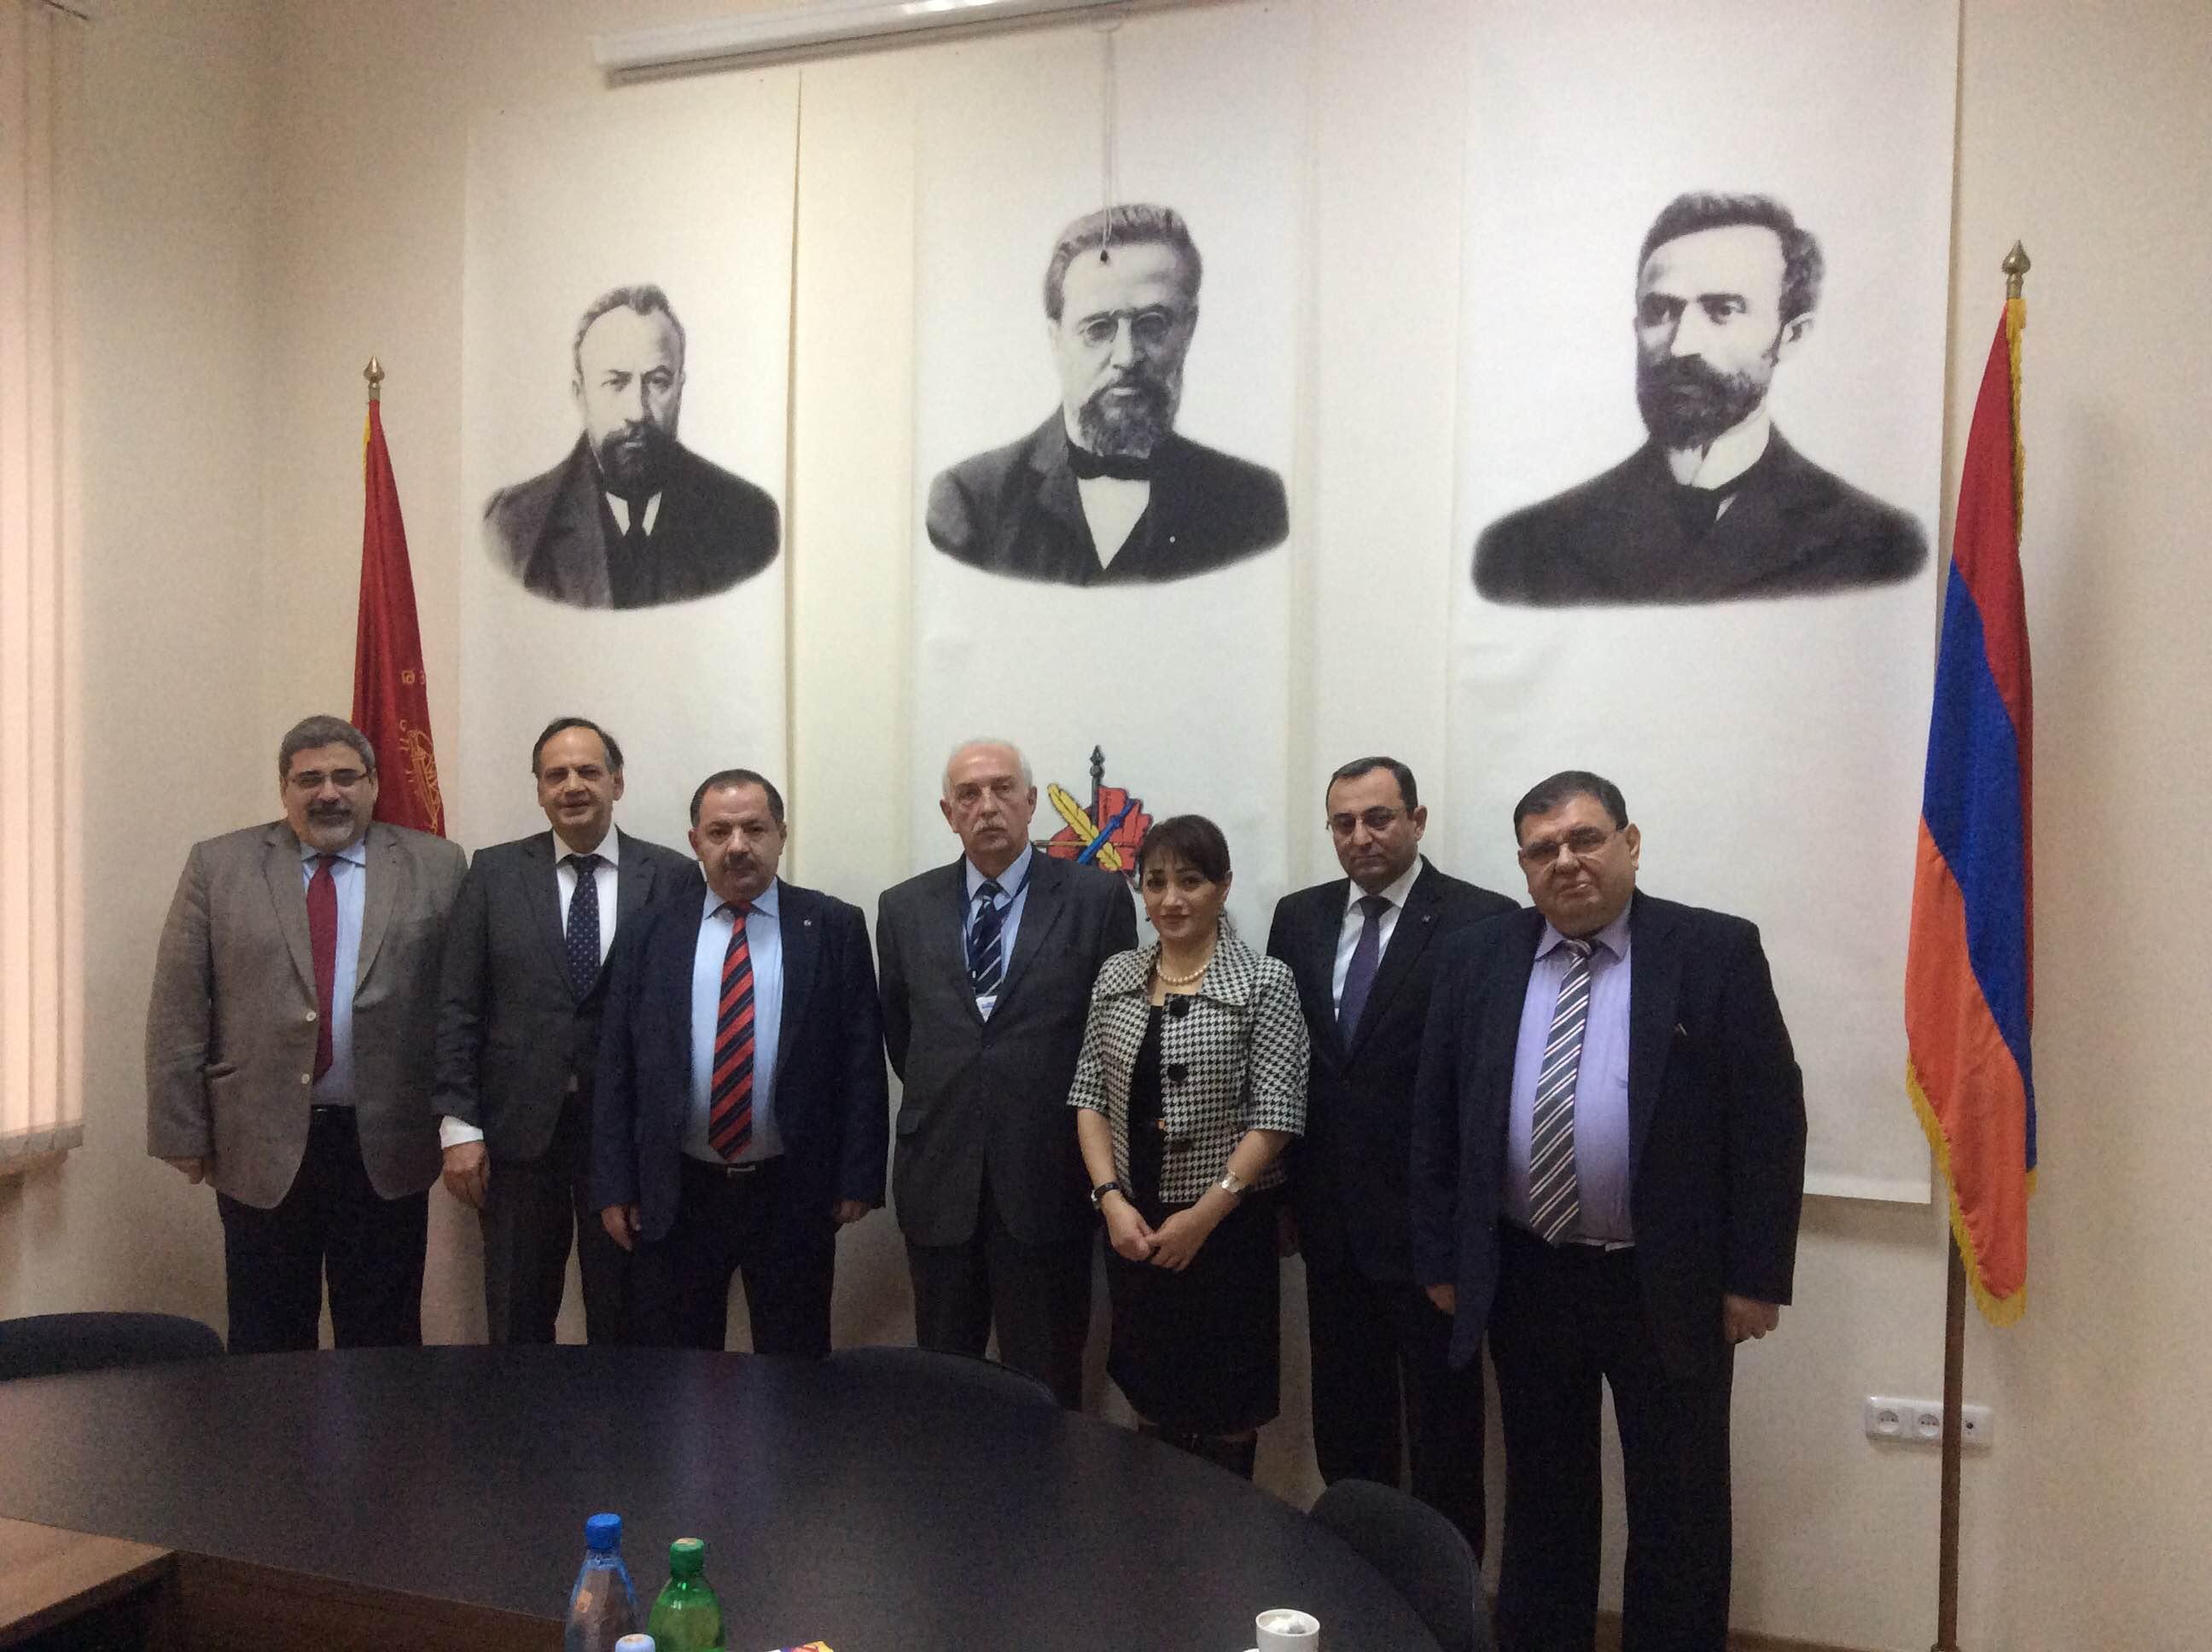 (L-R) Giro Manoyan, Knut Fleckenstein, Aghvan Vardanyan, Gia Jorjoliani, Lilit Galstyan, Artsvik Minasyan, Kaspar Karampetian